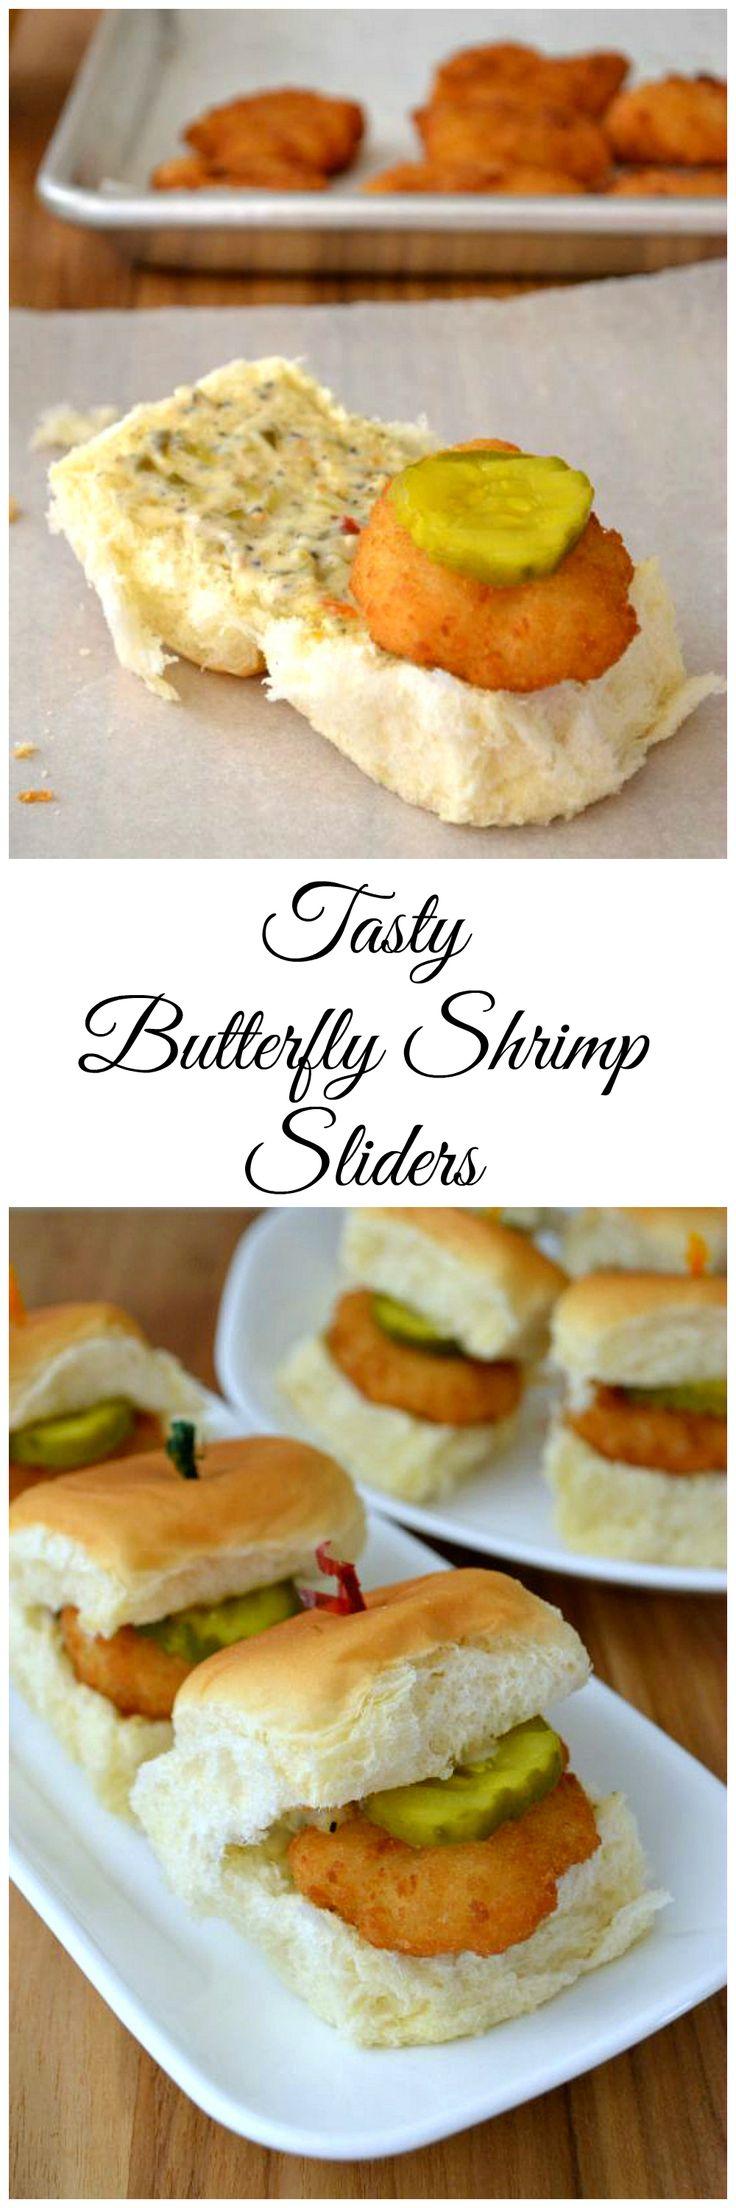 Easy Tasty Butterfly Shrimp Sliders #ad #SamsClubSeafood